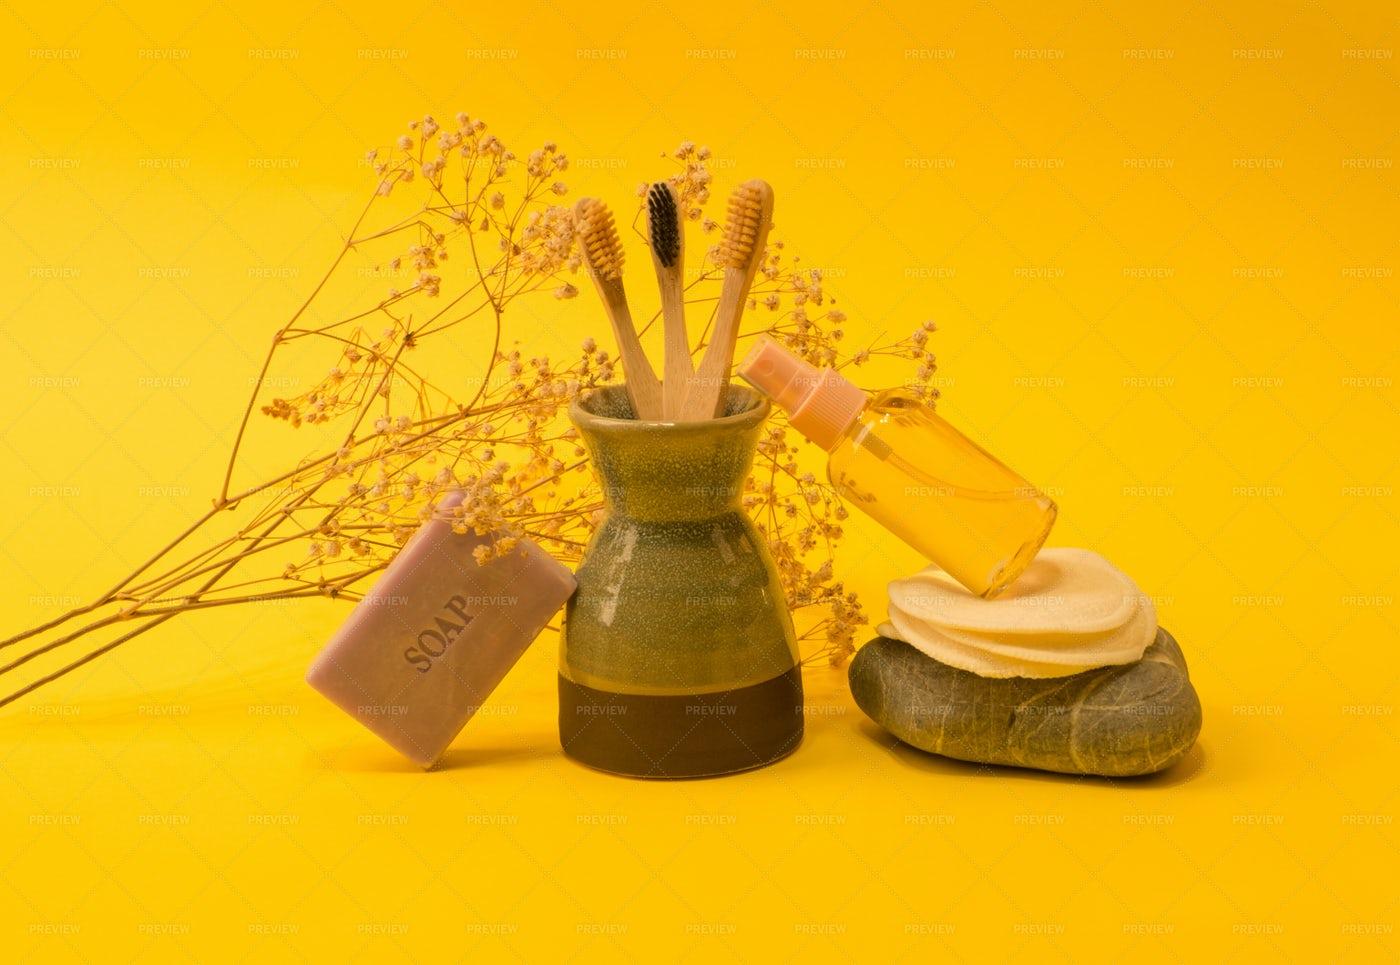 Zero Waste Beauty Products: Stock Photos